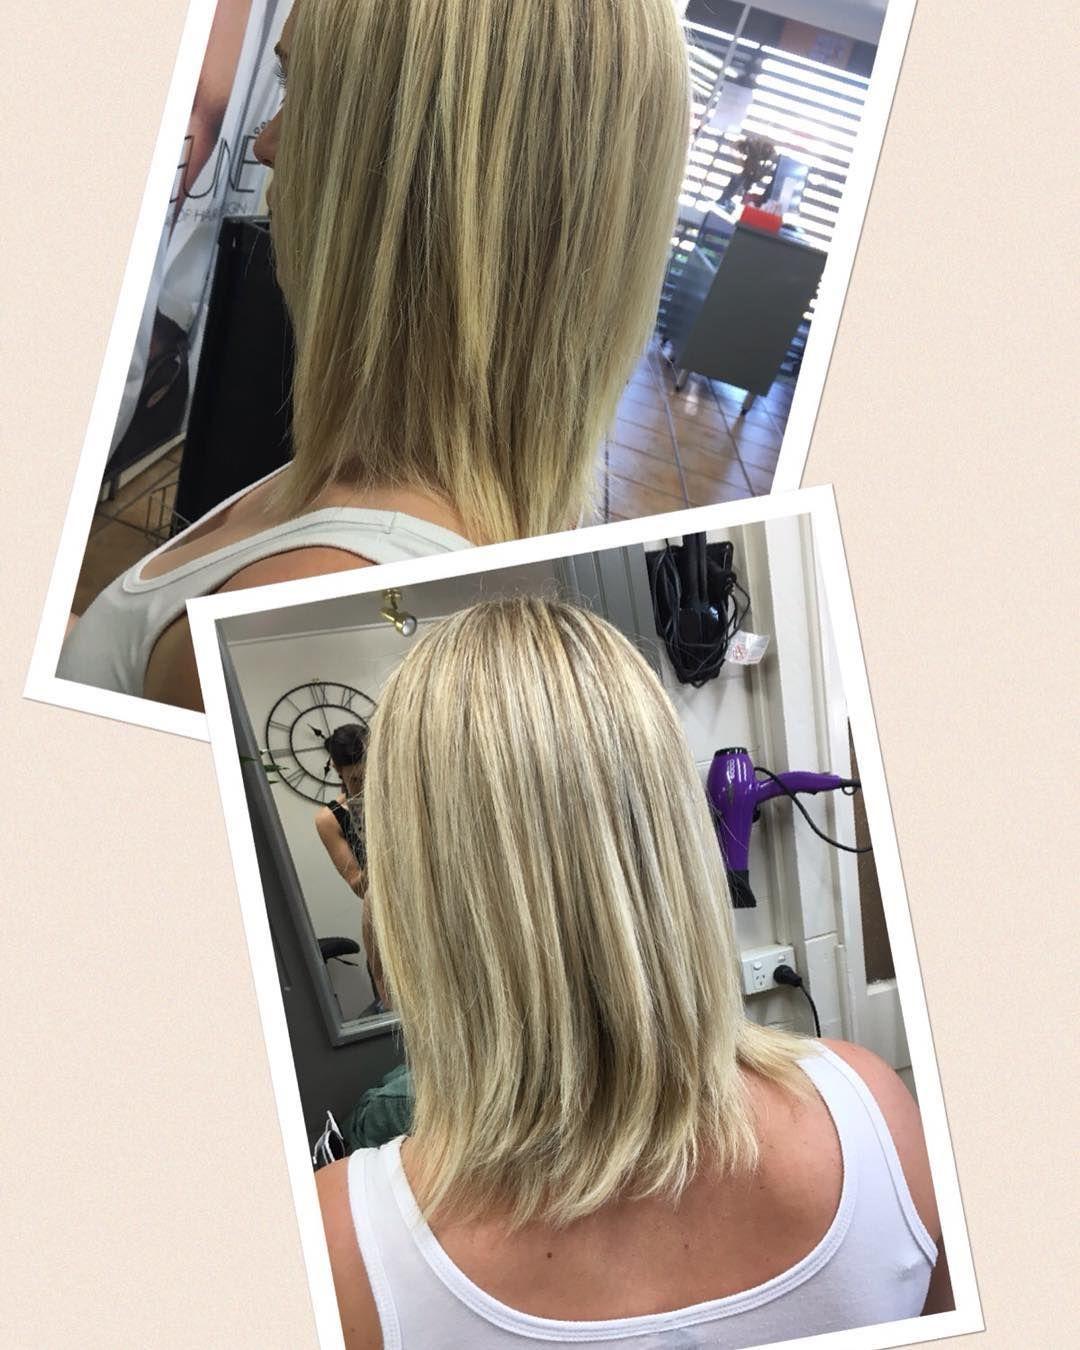 Instagram Photo By Riquita S Hair Studio May 20 2016 At 9 48pm Utc Hair Studio Hair Life Love Hair